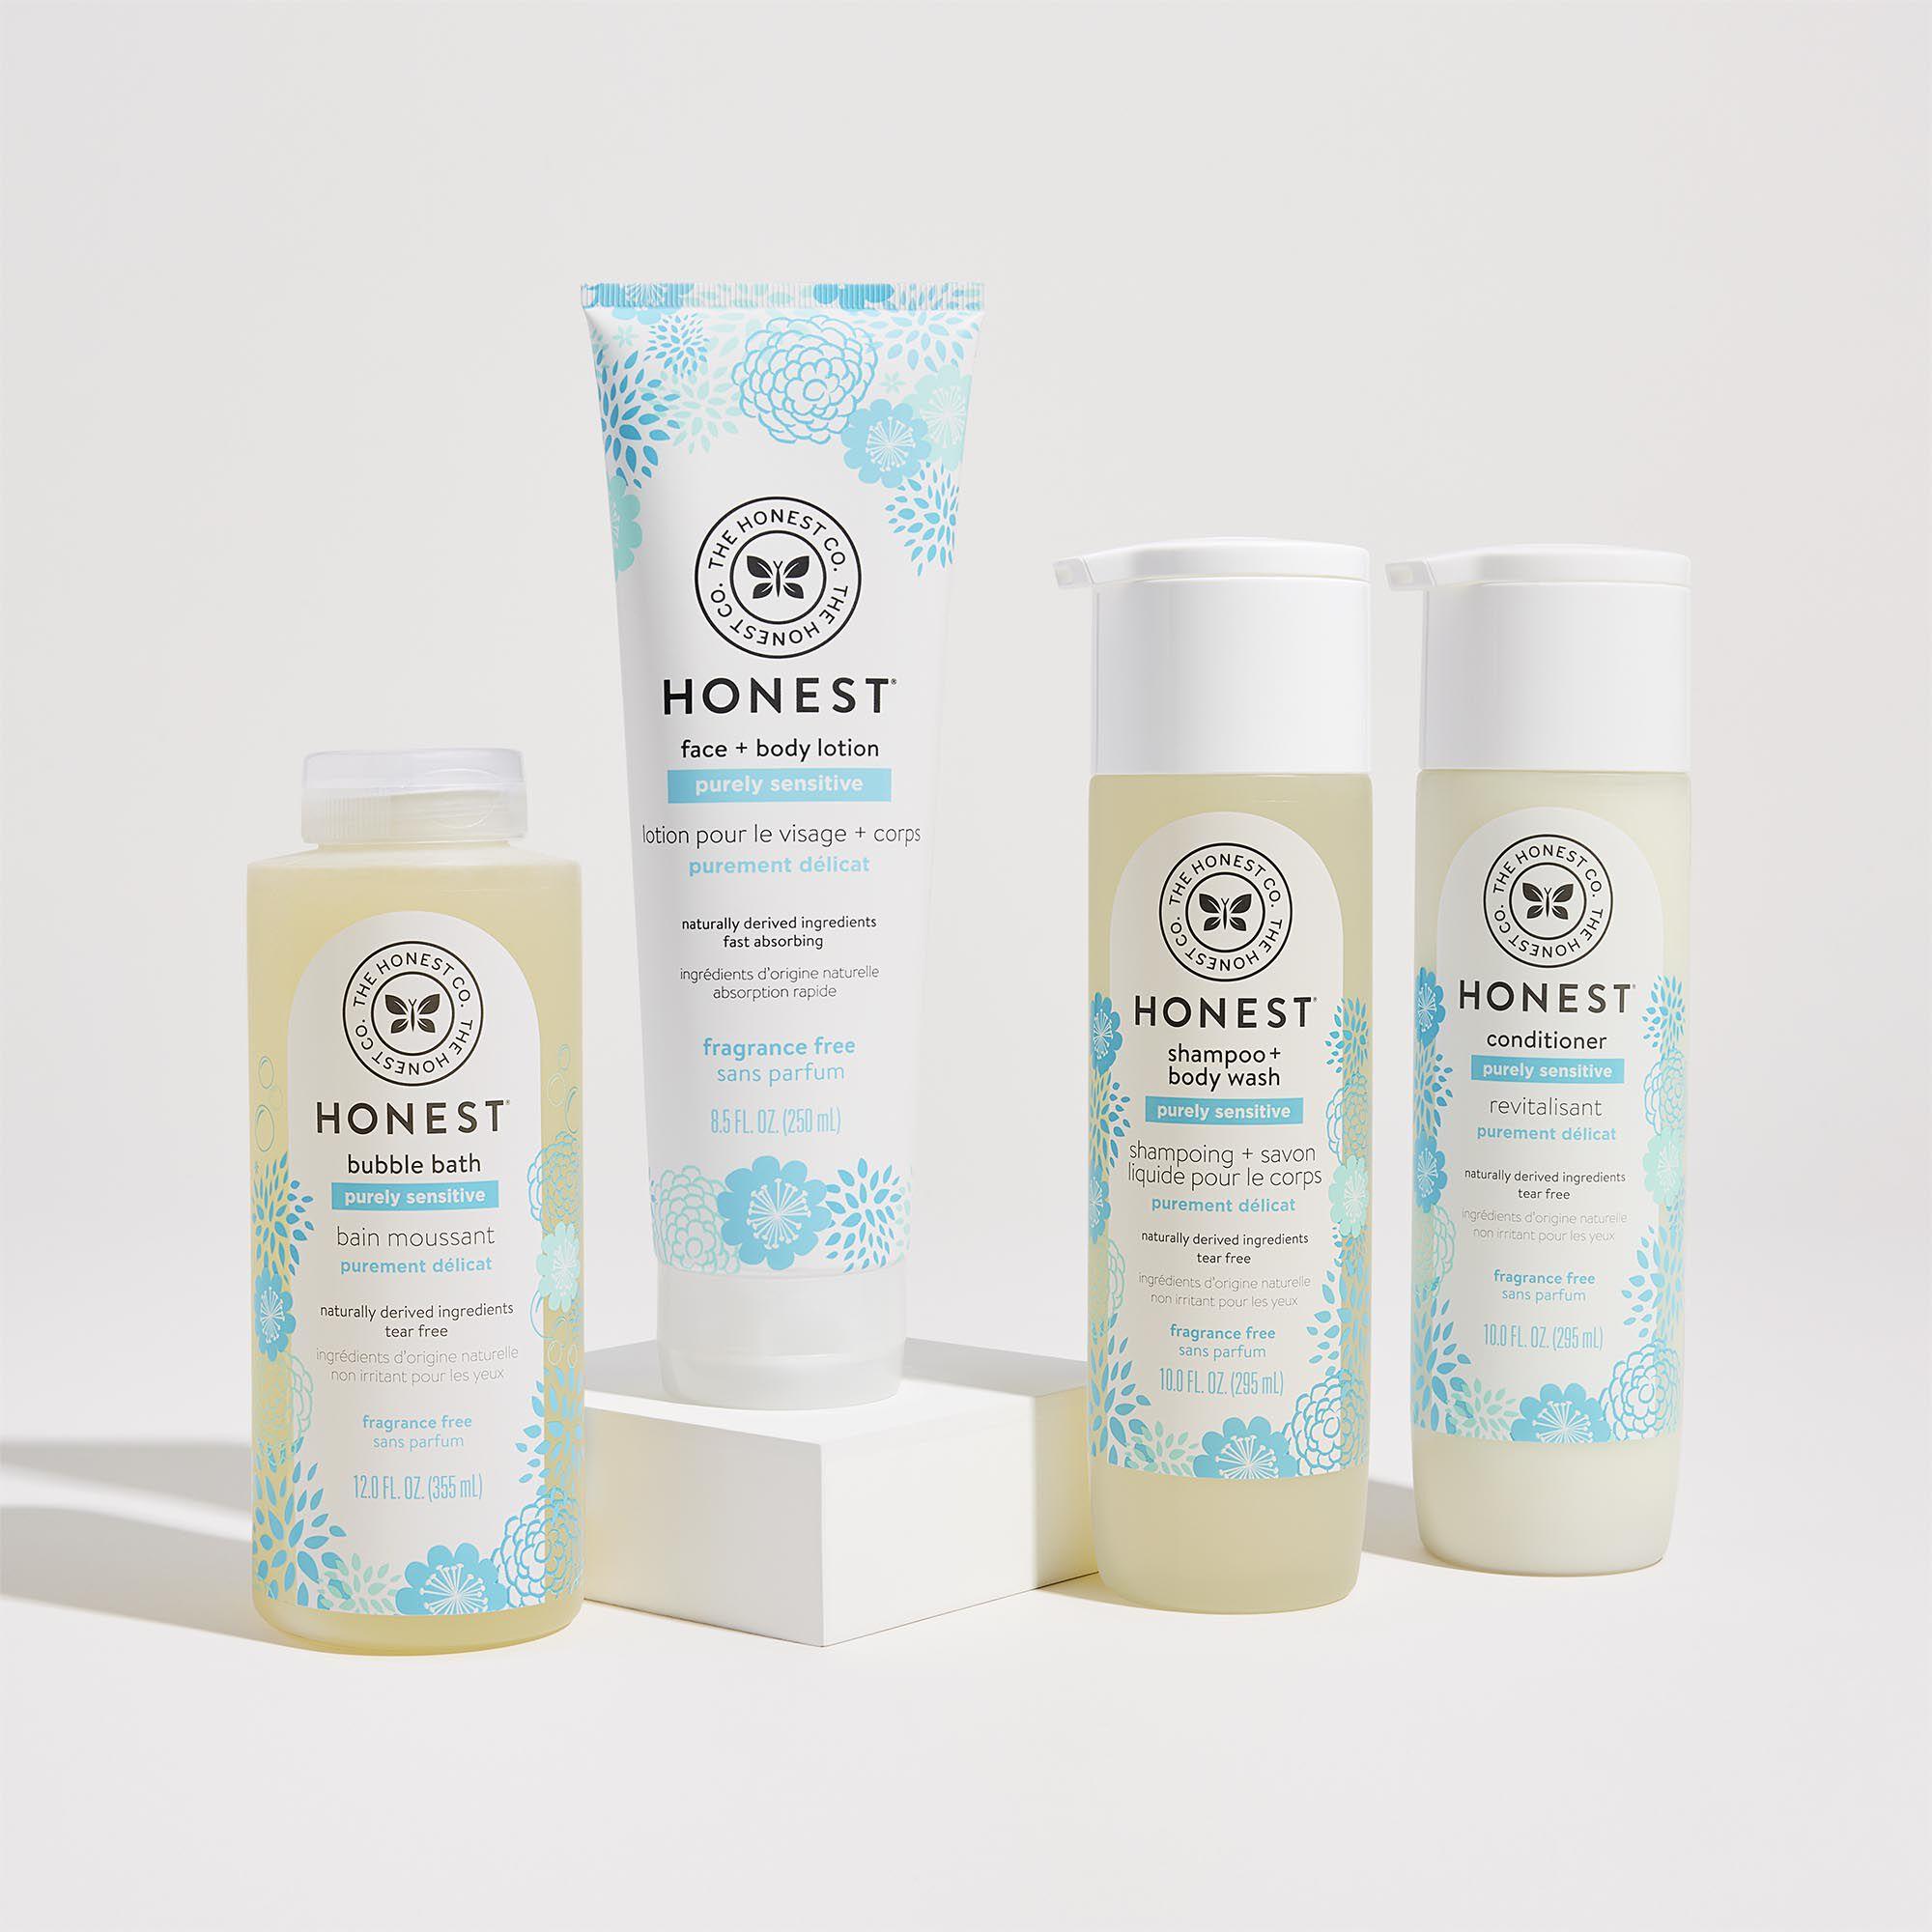 Purely Sensitive Bathtime Routine, contents include shampoo, conditioner, lotion and bubble bath